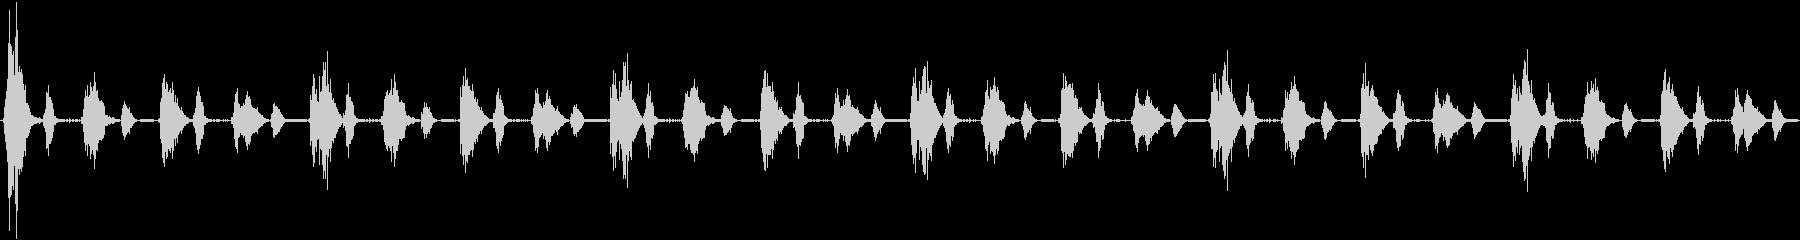 THIN CHUFFING MAC...の未再生の波形